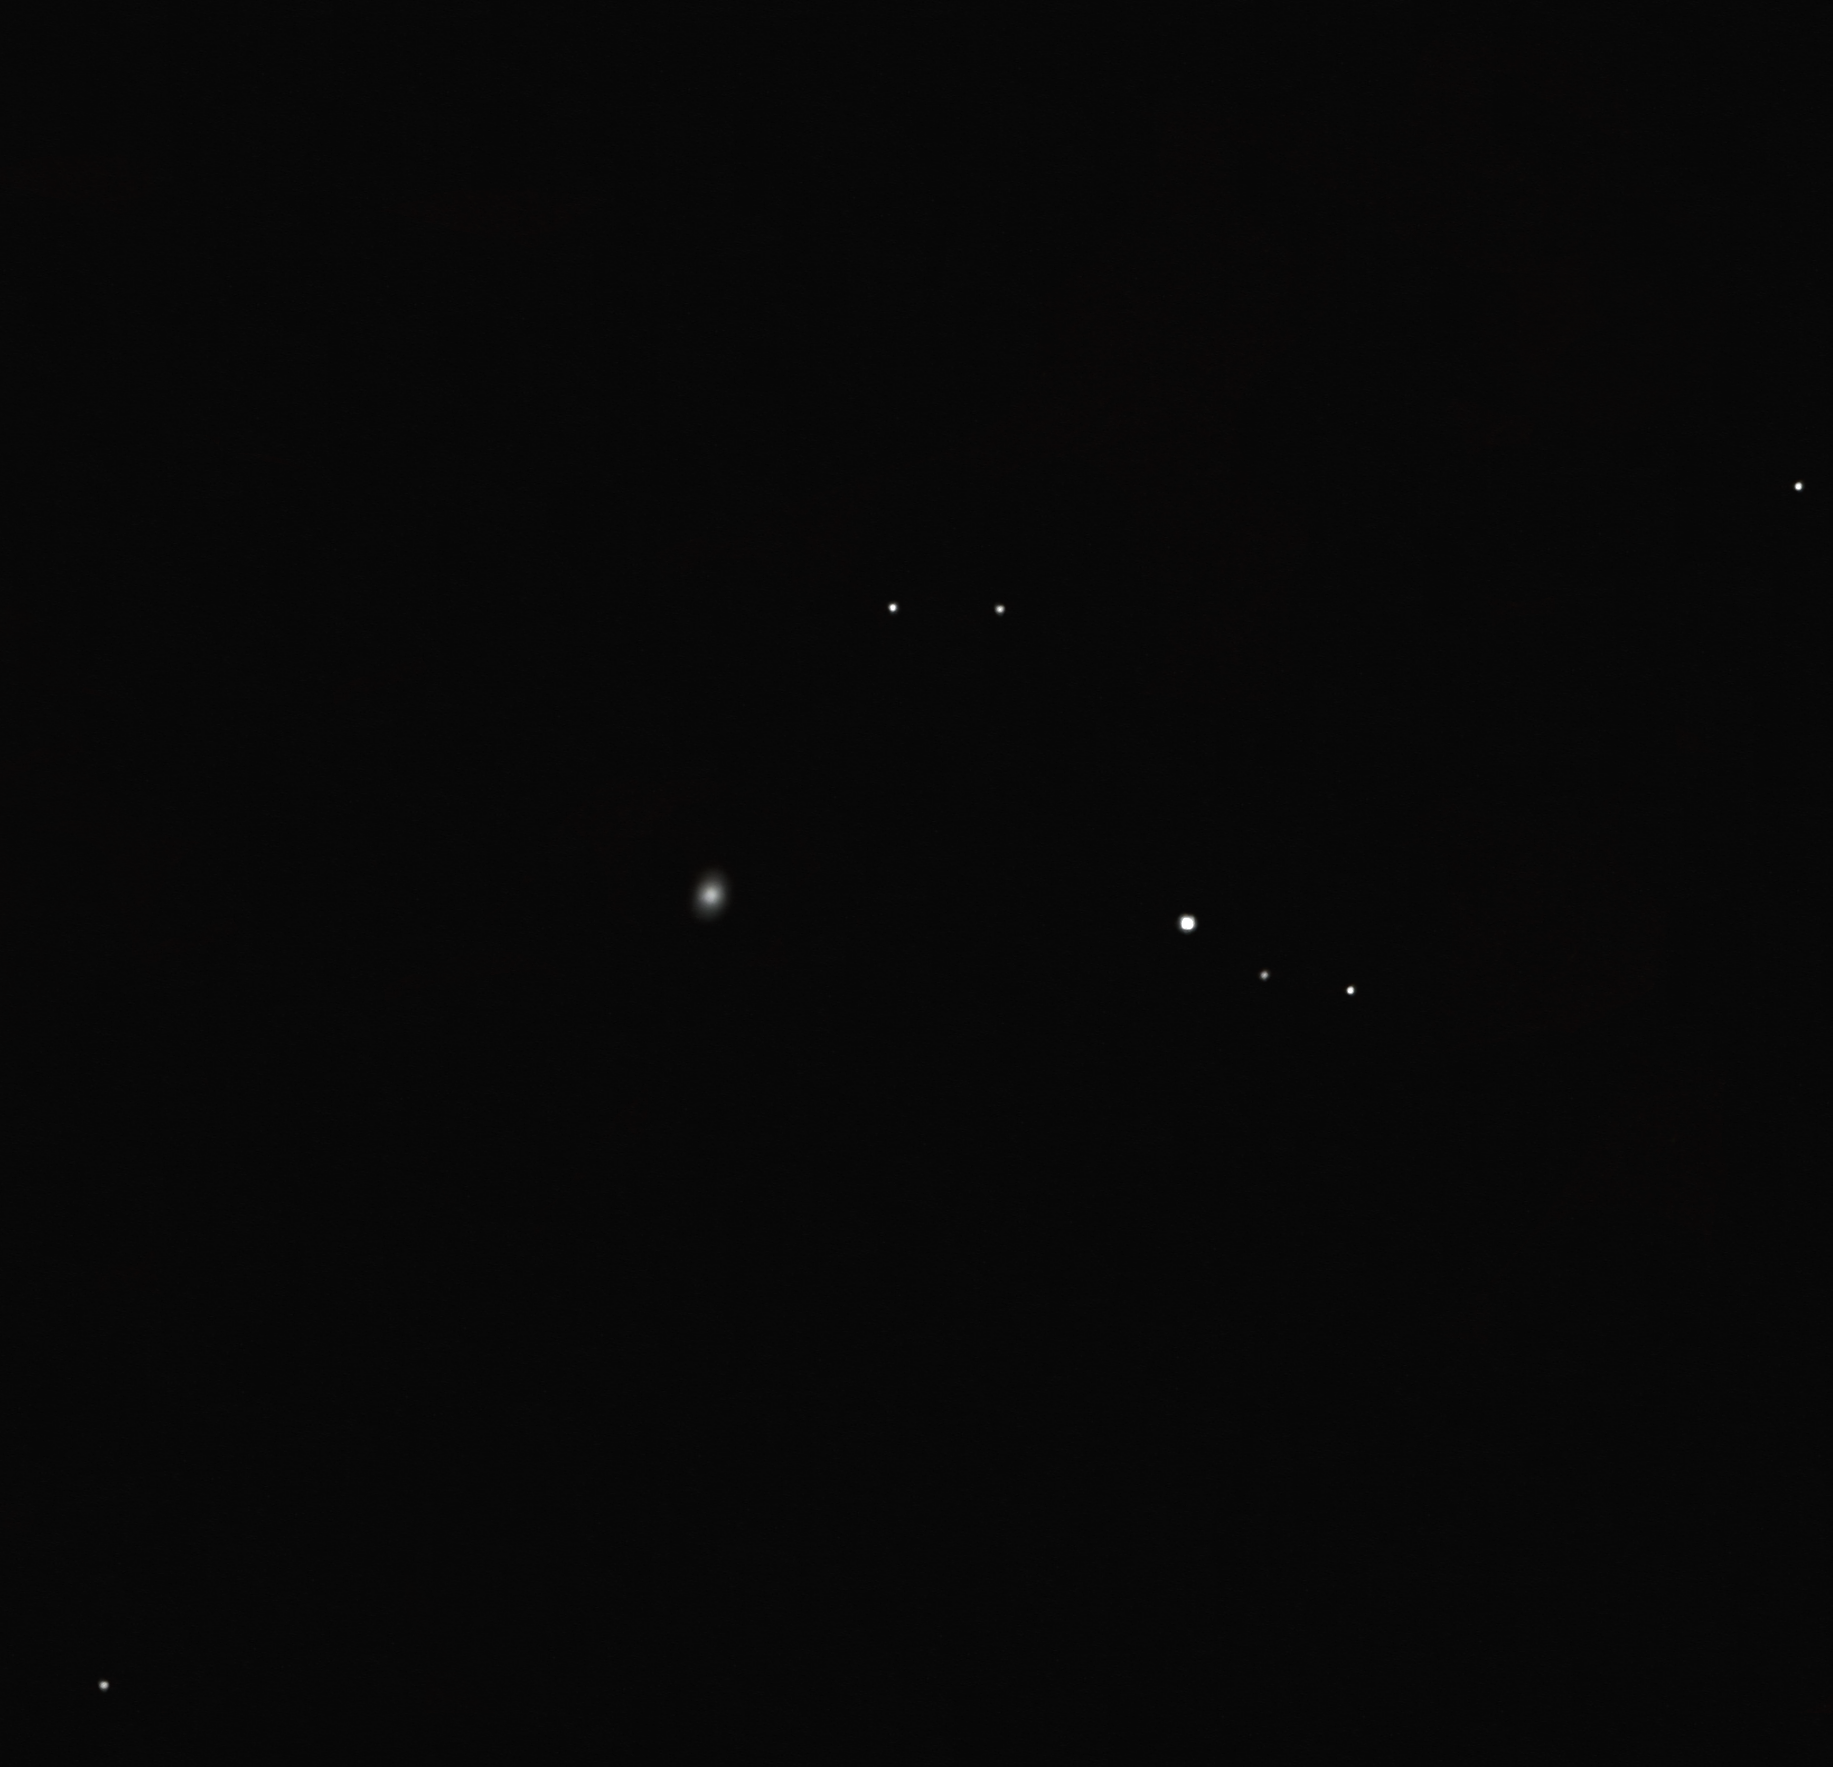 Shane 1 planetary nebula